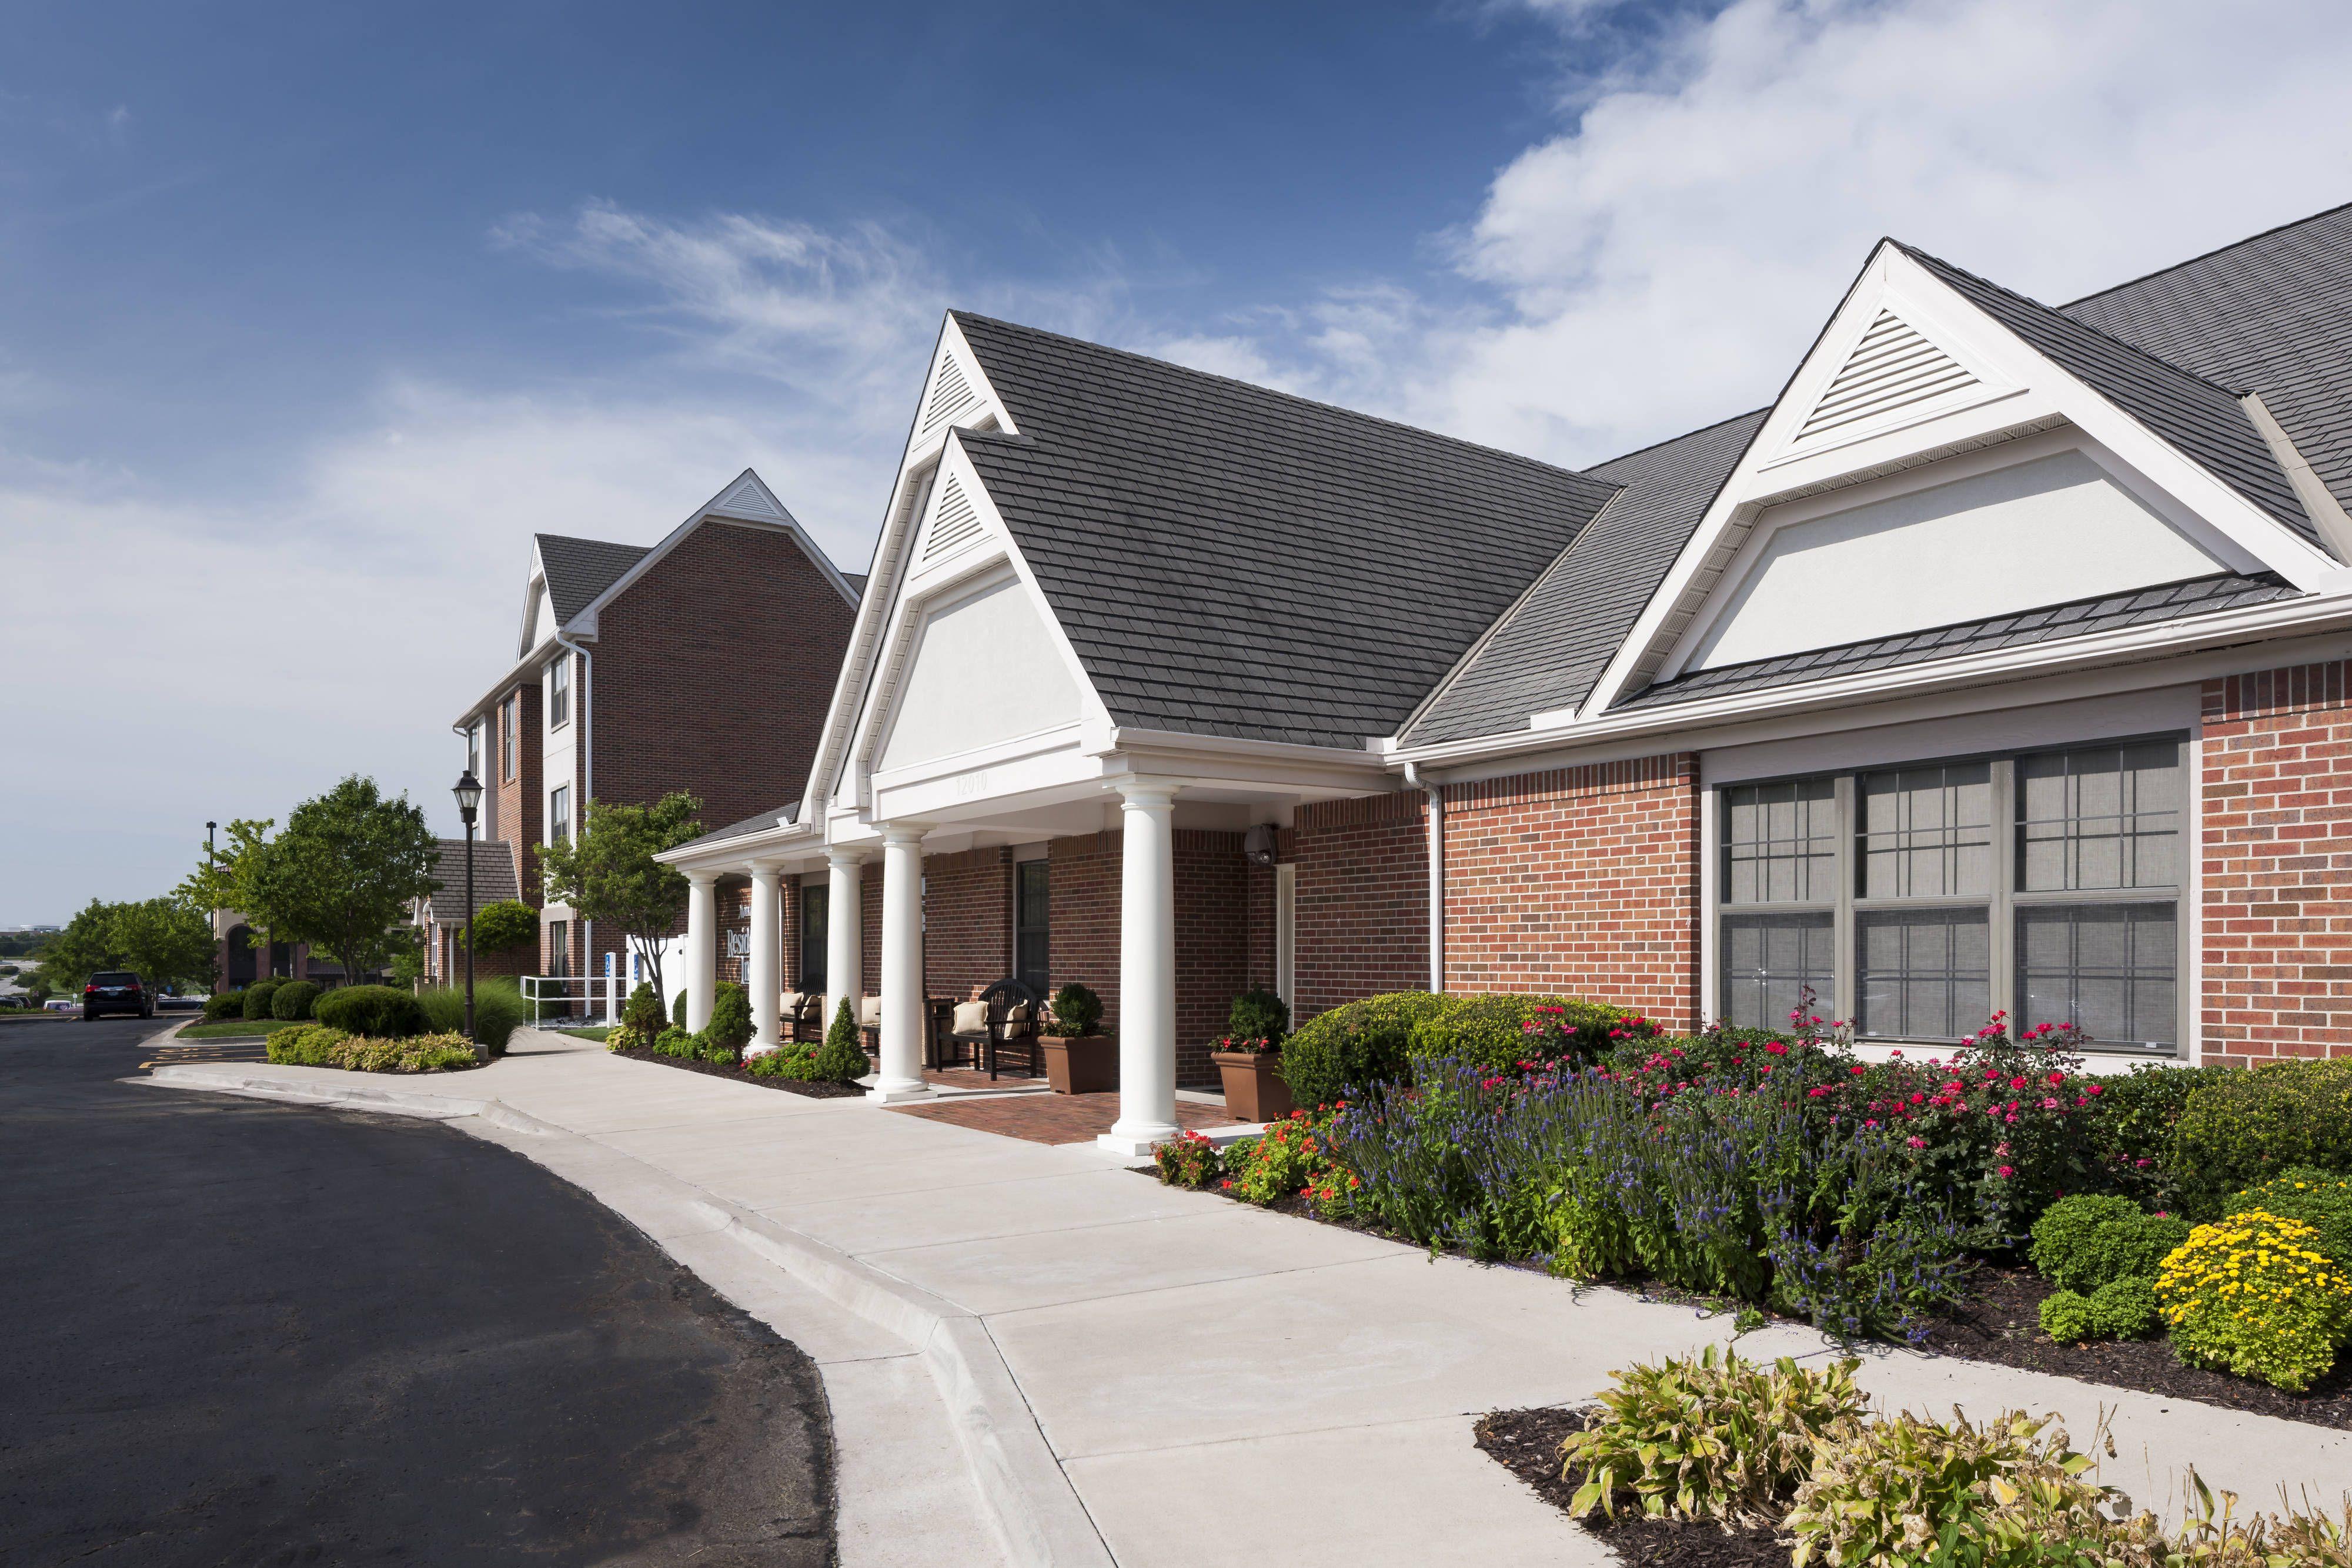 Residence Inn Kansas City Overland Park Exterior Hotels Suite Holiday Overland Park Residences Hotel